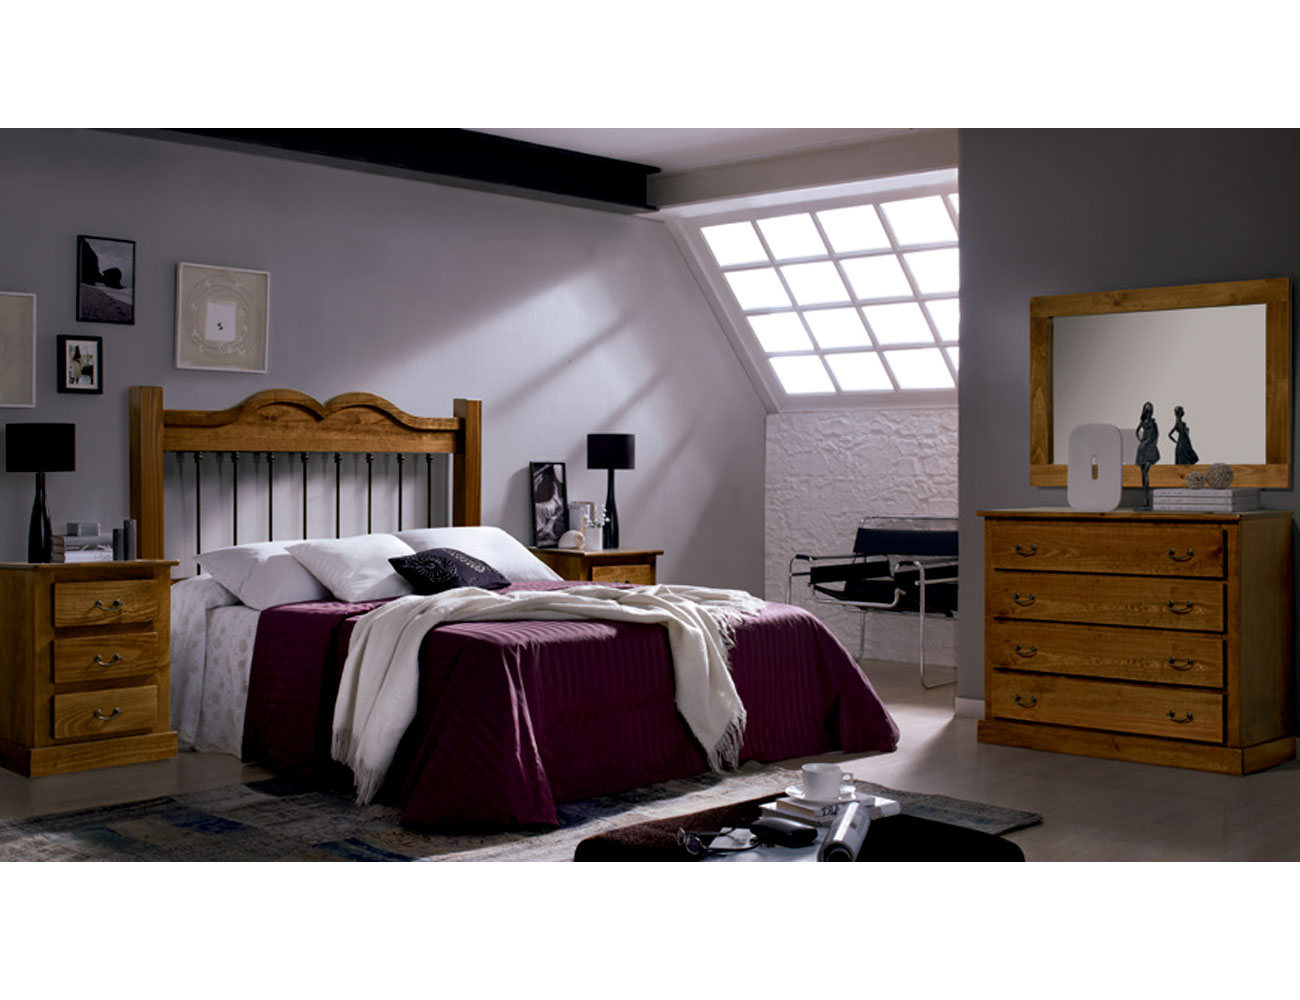 Dormitorio matrimonio comoda cabecero forja